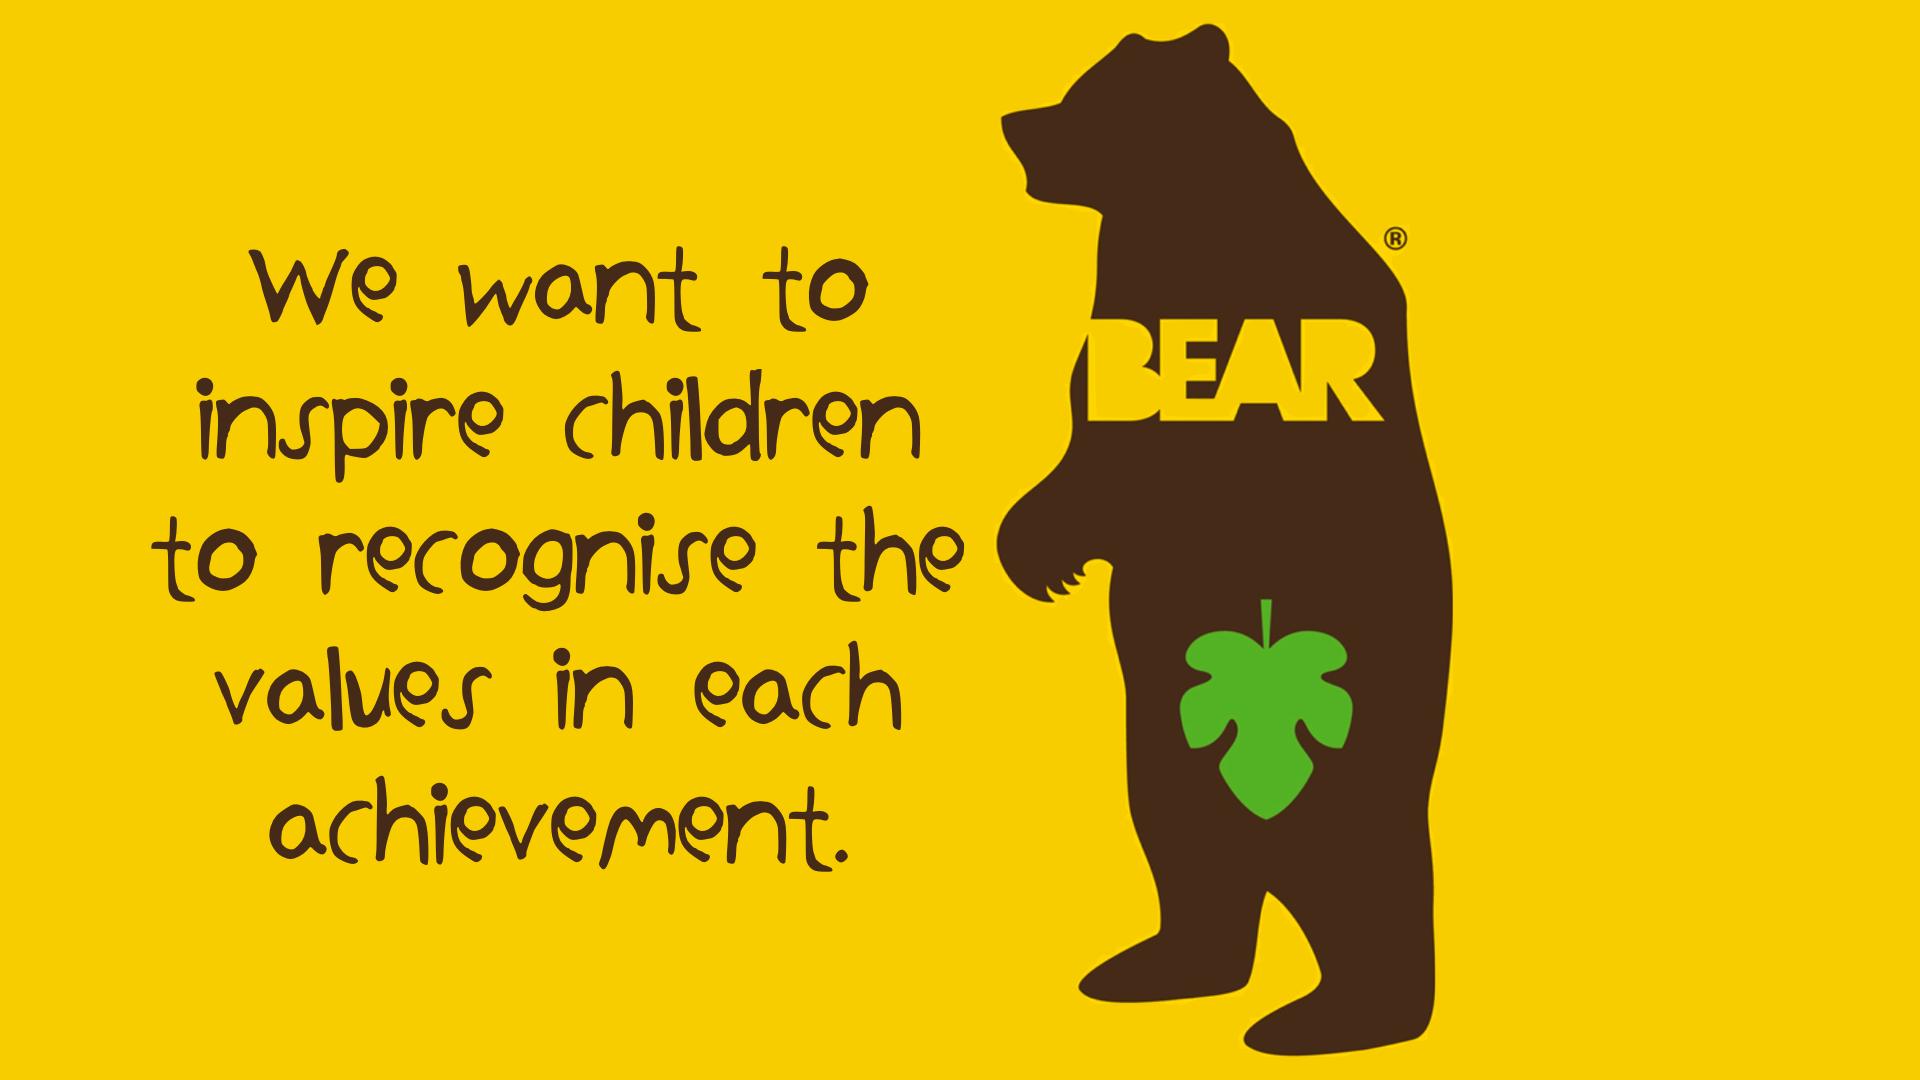 Bear Ideas 19th October 2016.015 Natalie Palmer Sutton | hand illustrated ideas for Bear Nibbles 41.jpeg